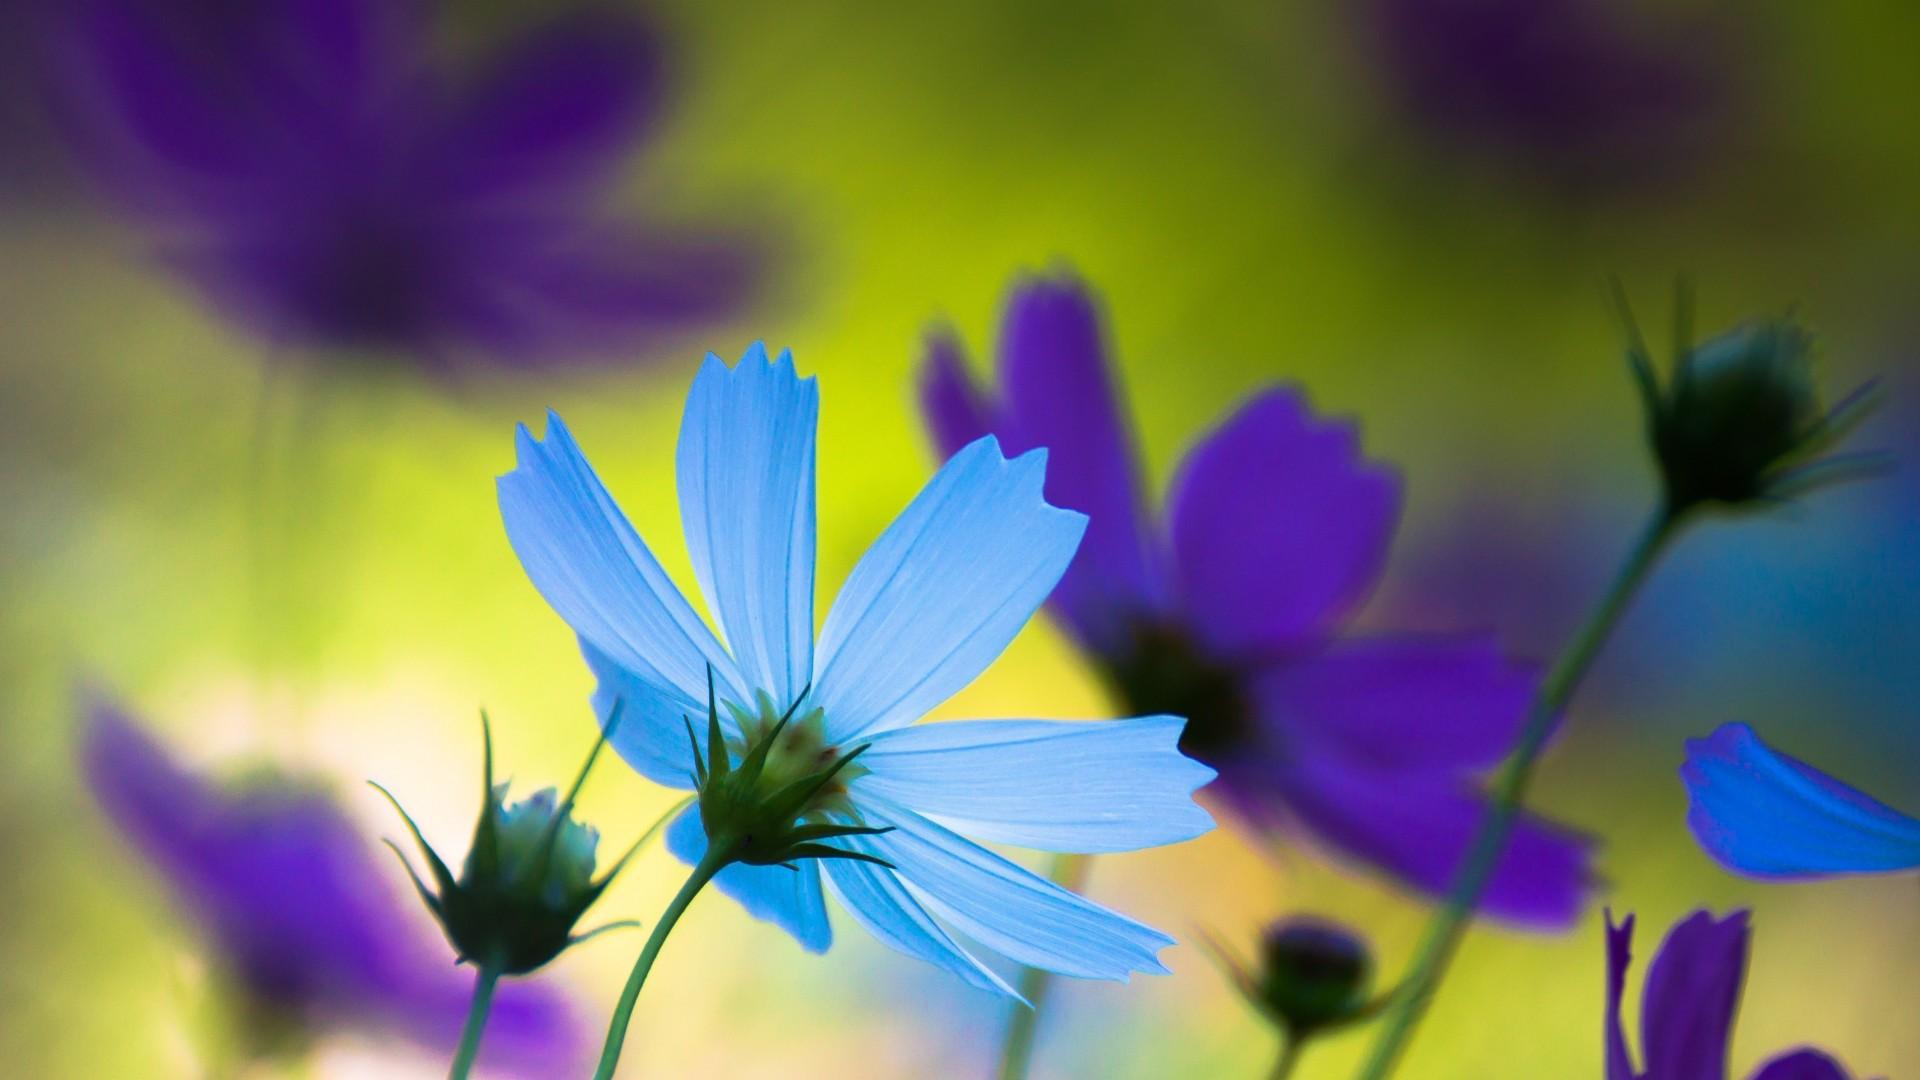 pretty cosmos flowers